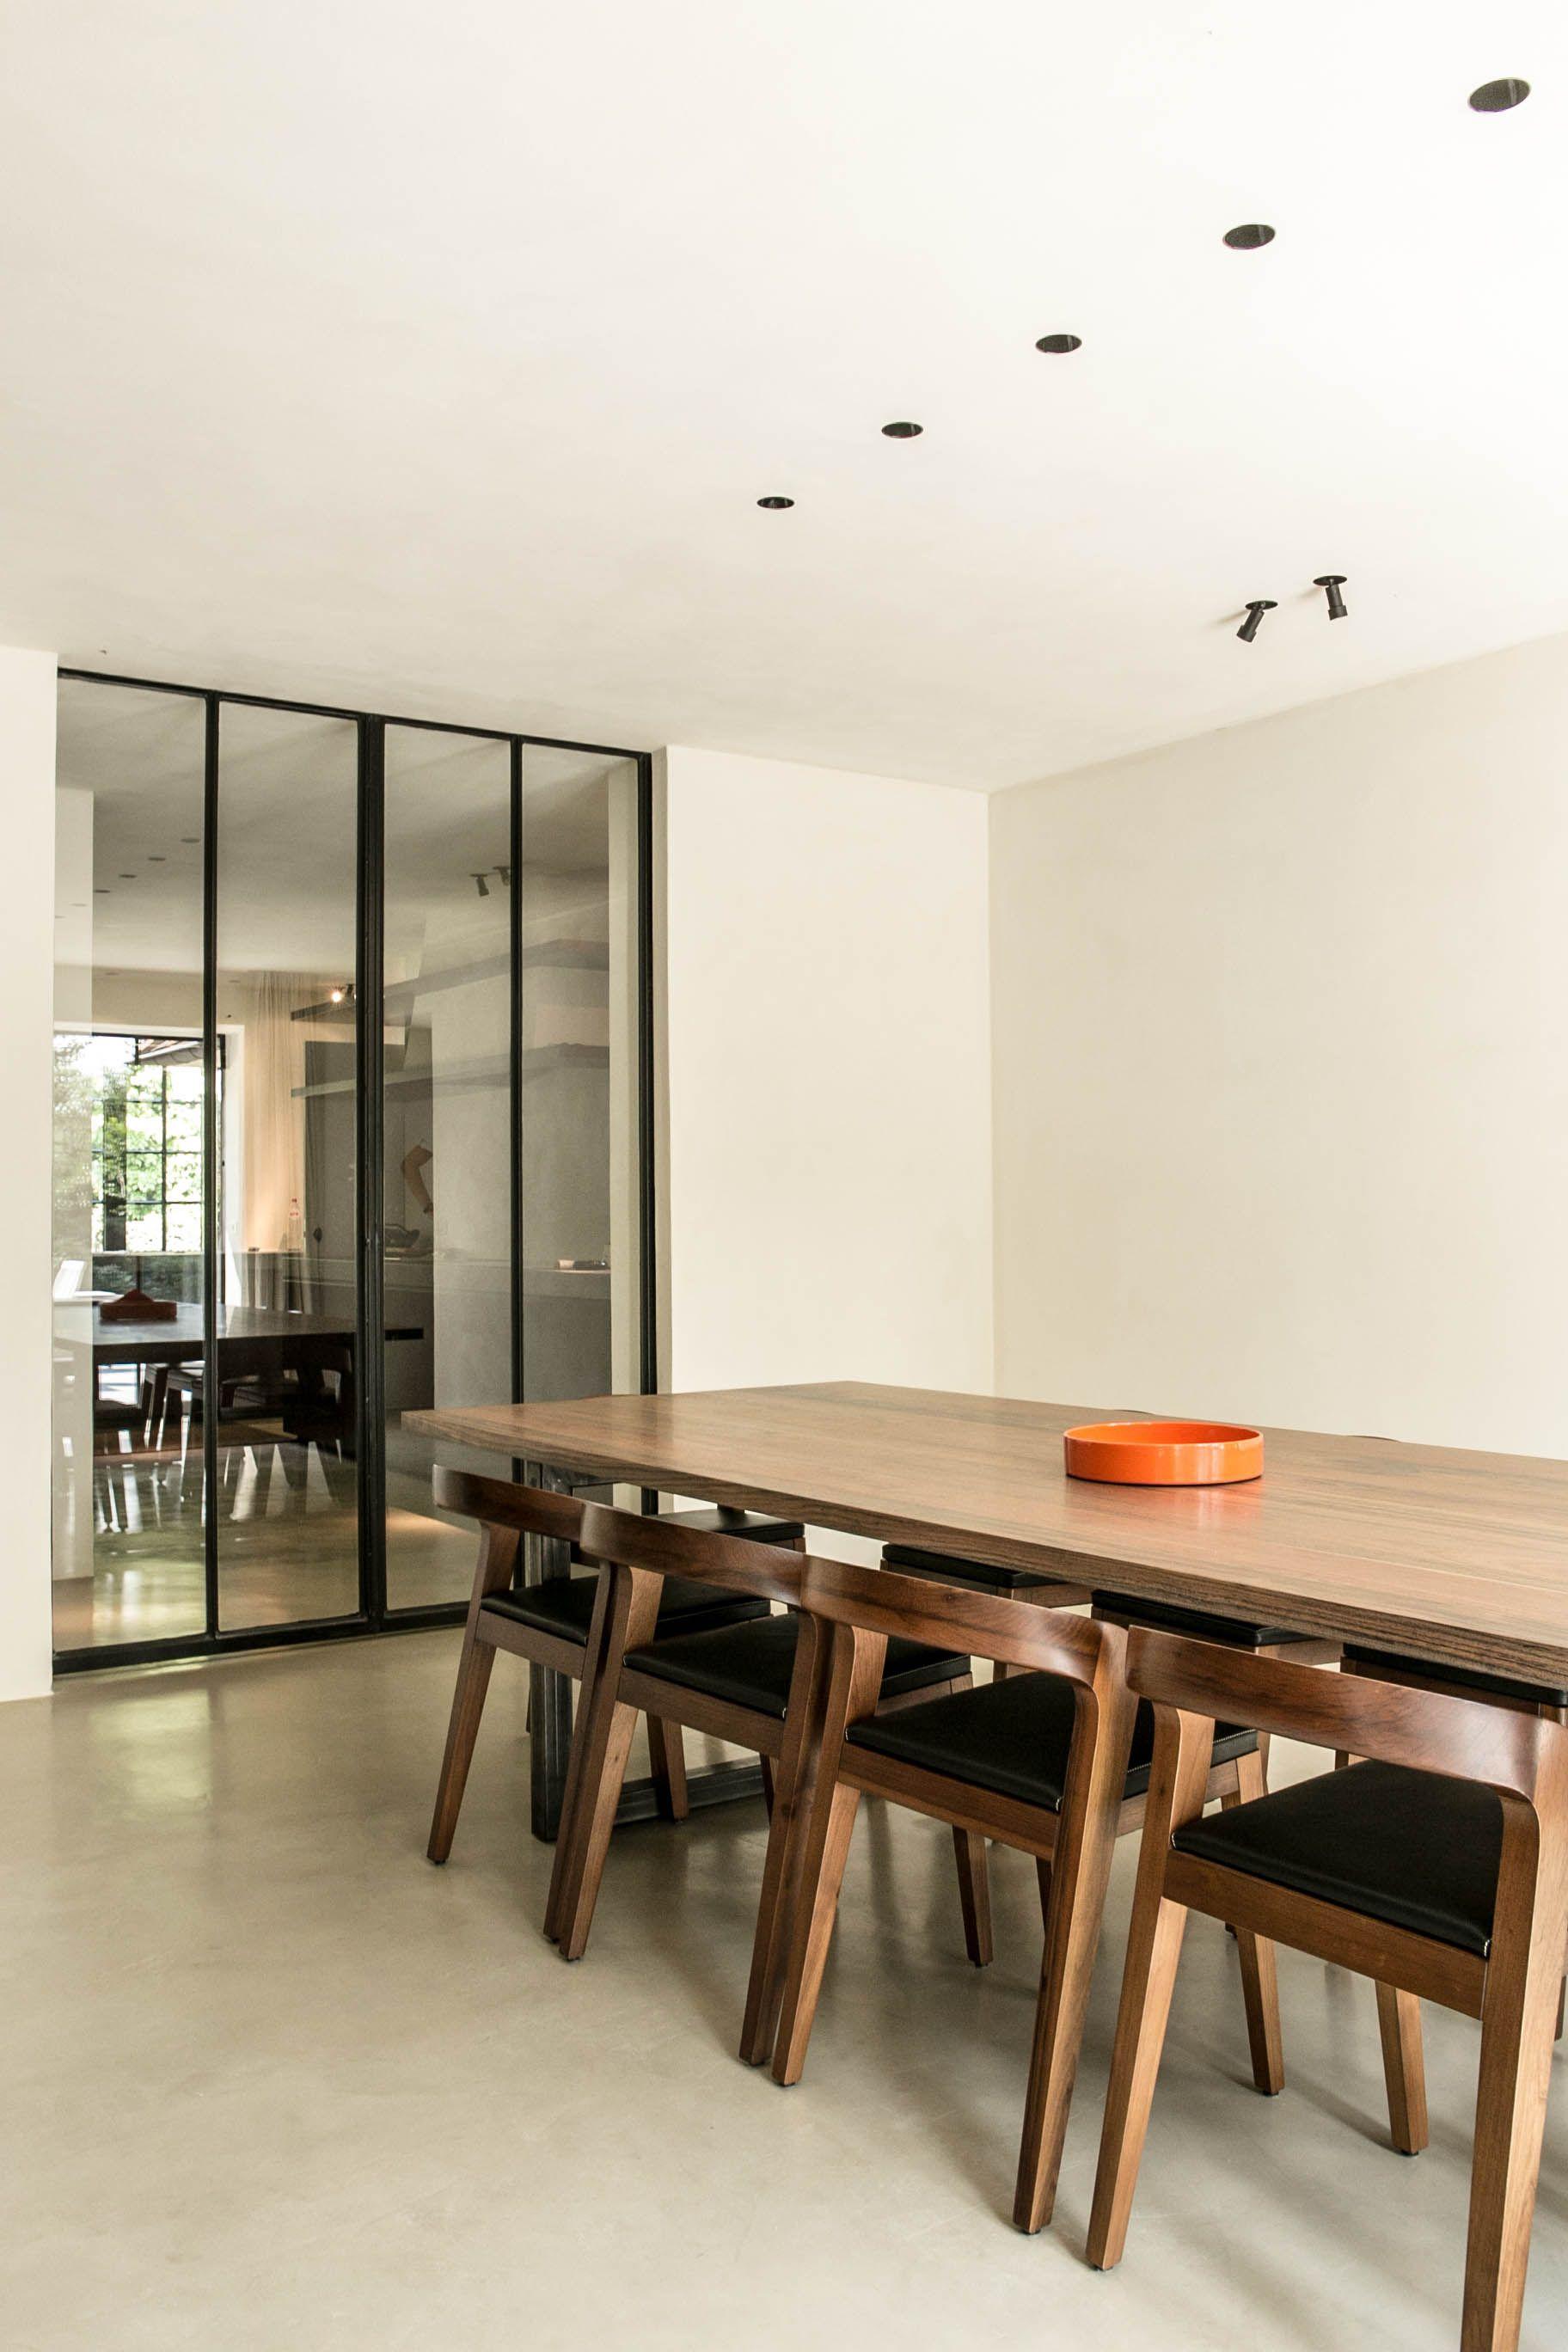 design benoit viaene kitchen pinterest interiors living room designs hd images living room designs hd images